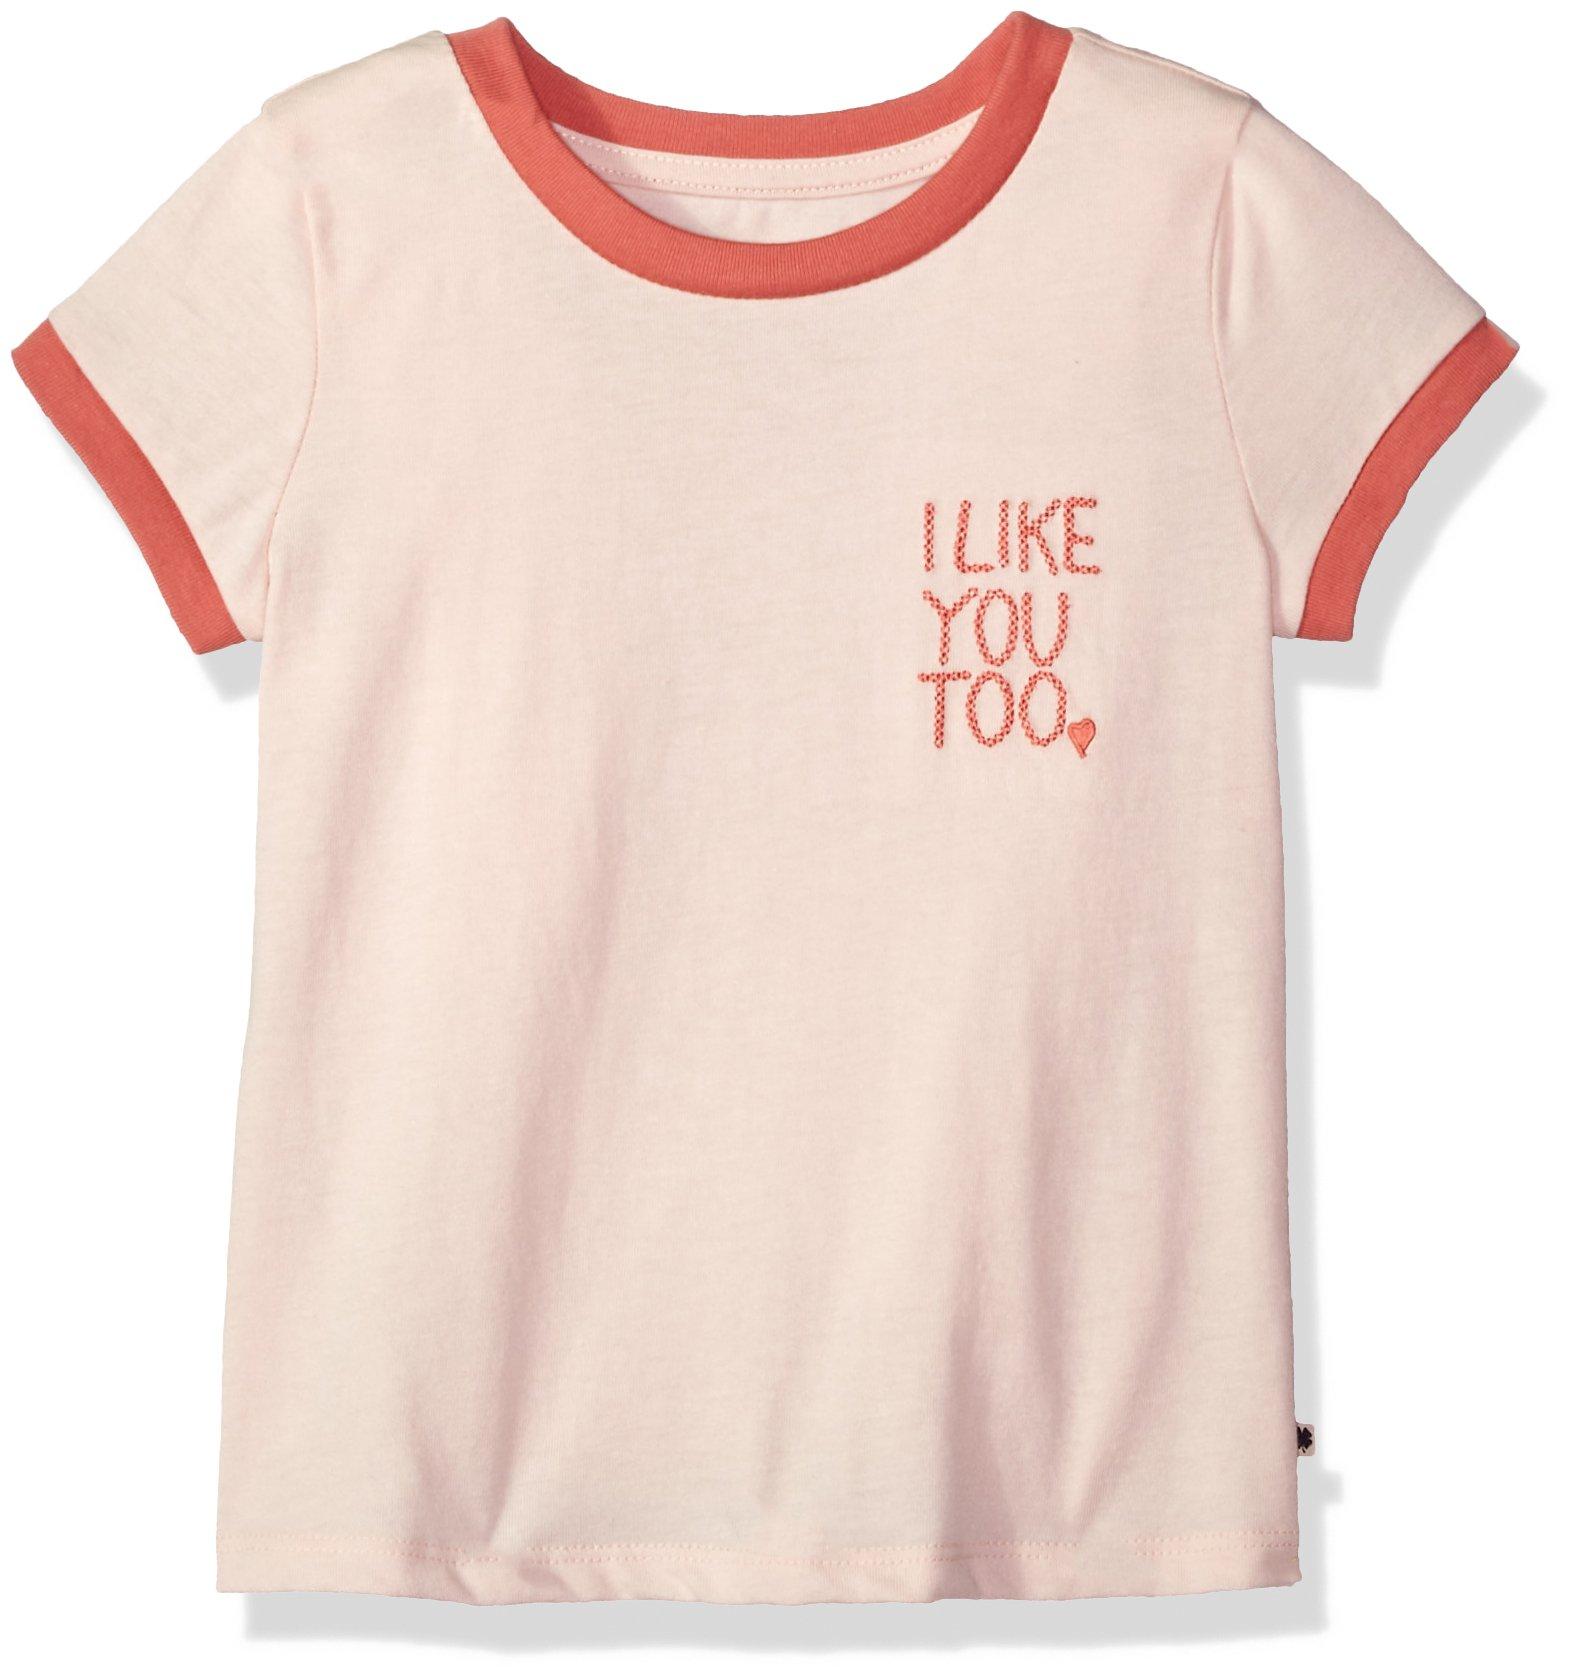 Lucky Brand Big Girls' Graphic Tee, Jocelyn Peach Blush, Medium (8/10)